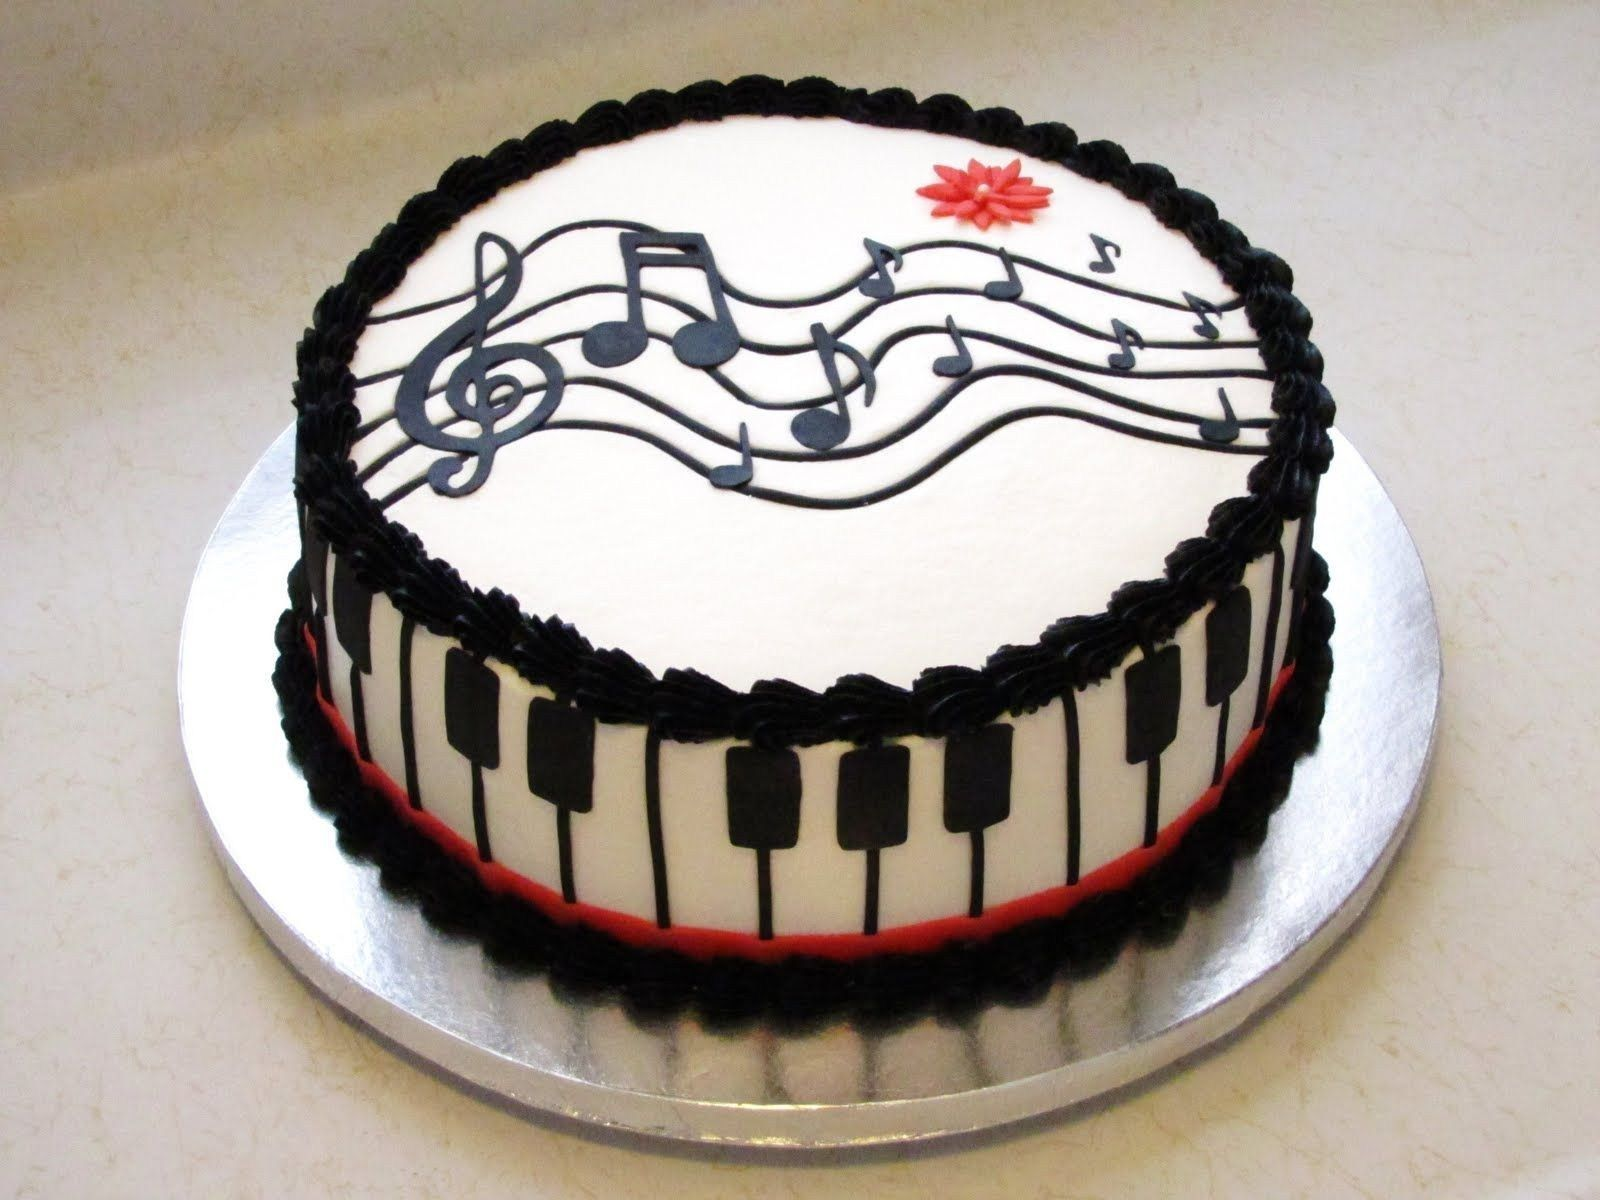 Surprising Piano Birthday Cake Yeah Someone Can Make This For My Birthday Birthday Cards Printable Benkemecafe Filternl